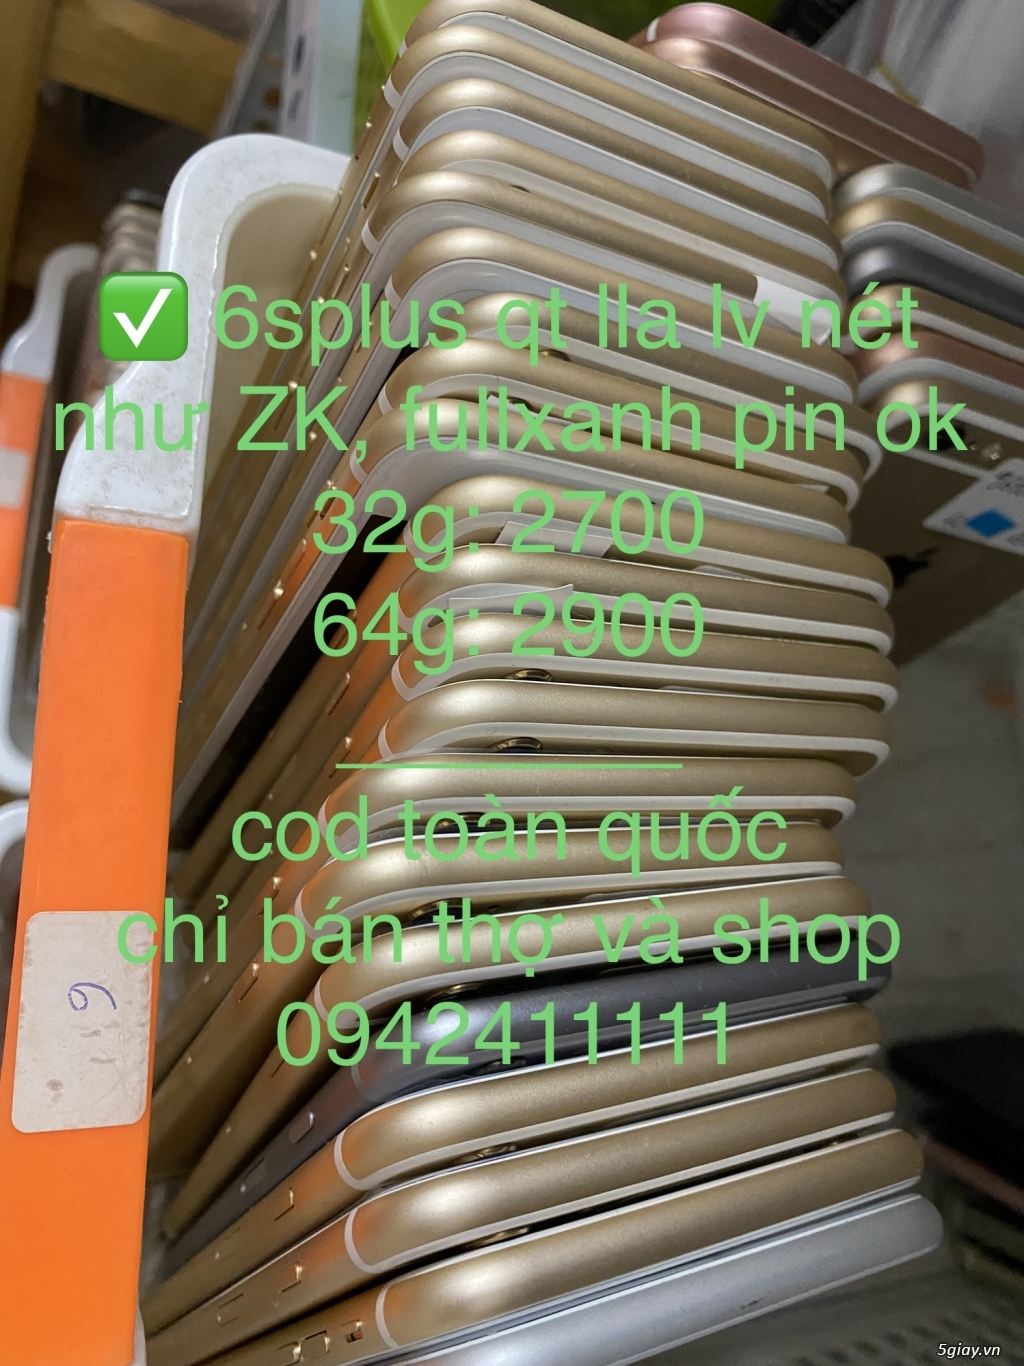 Bảng Giá Sỉ iPhone 6s   6splus   7g   7plus   8g   8plus QT lla (COD) - 3